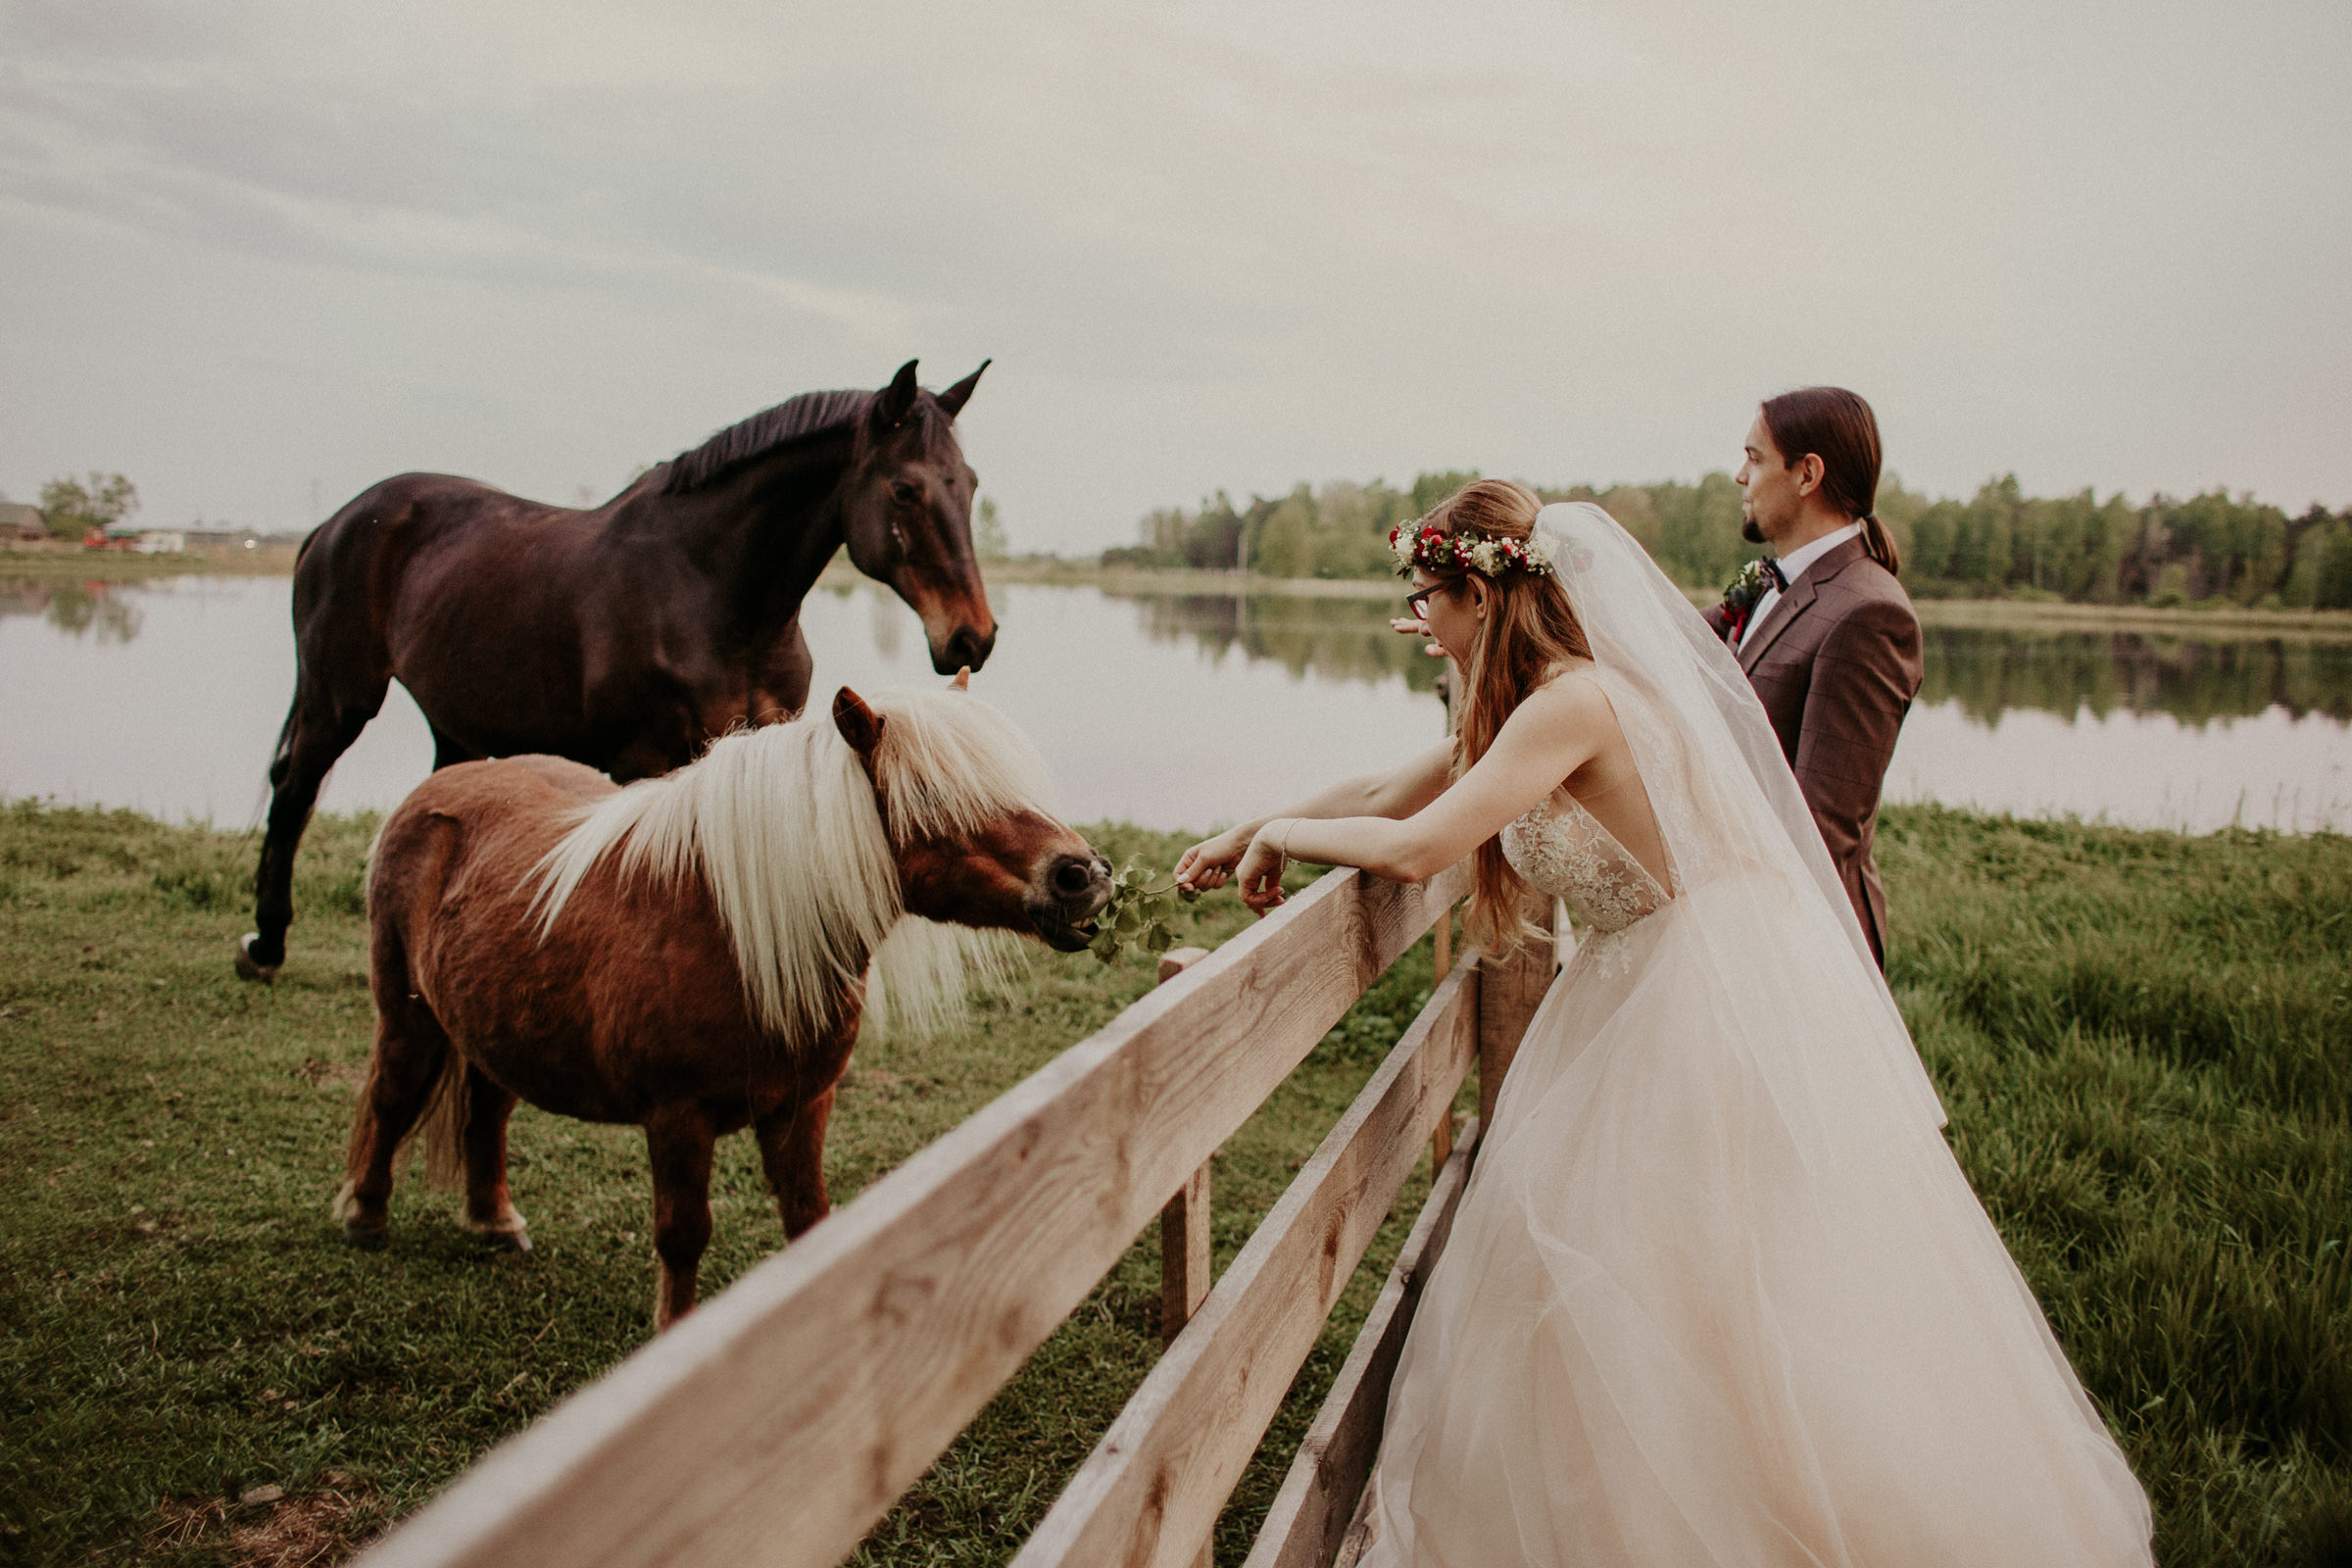 sesja z koniami